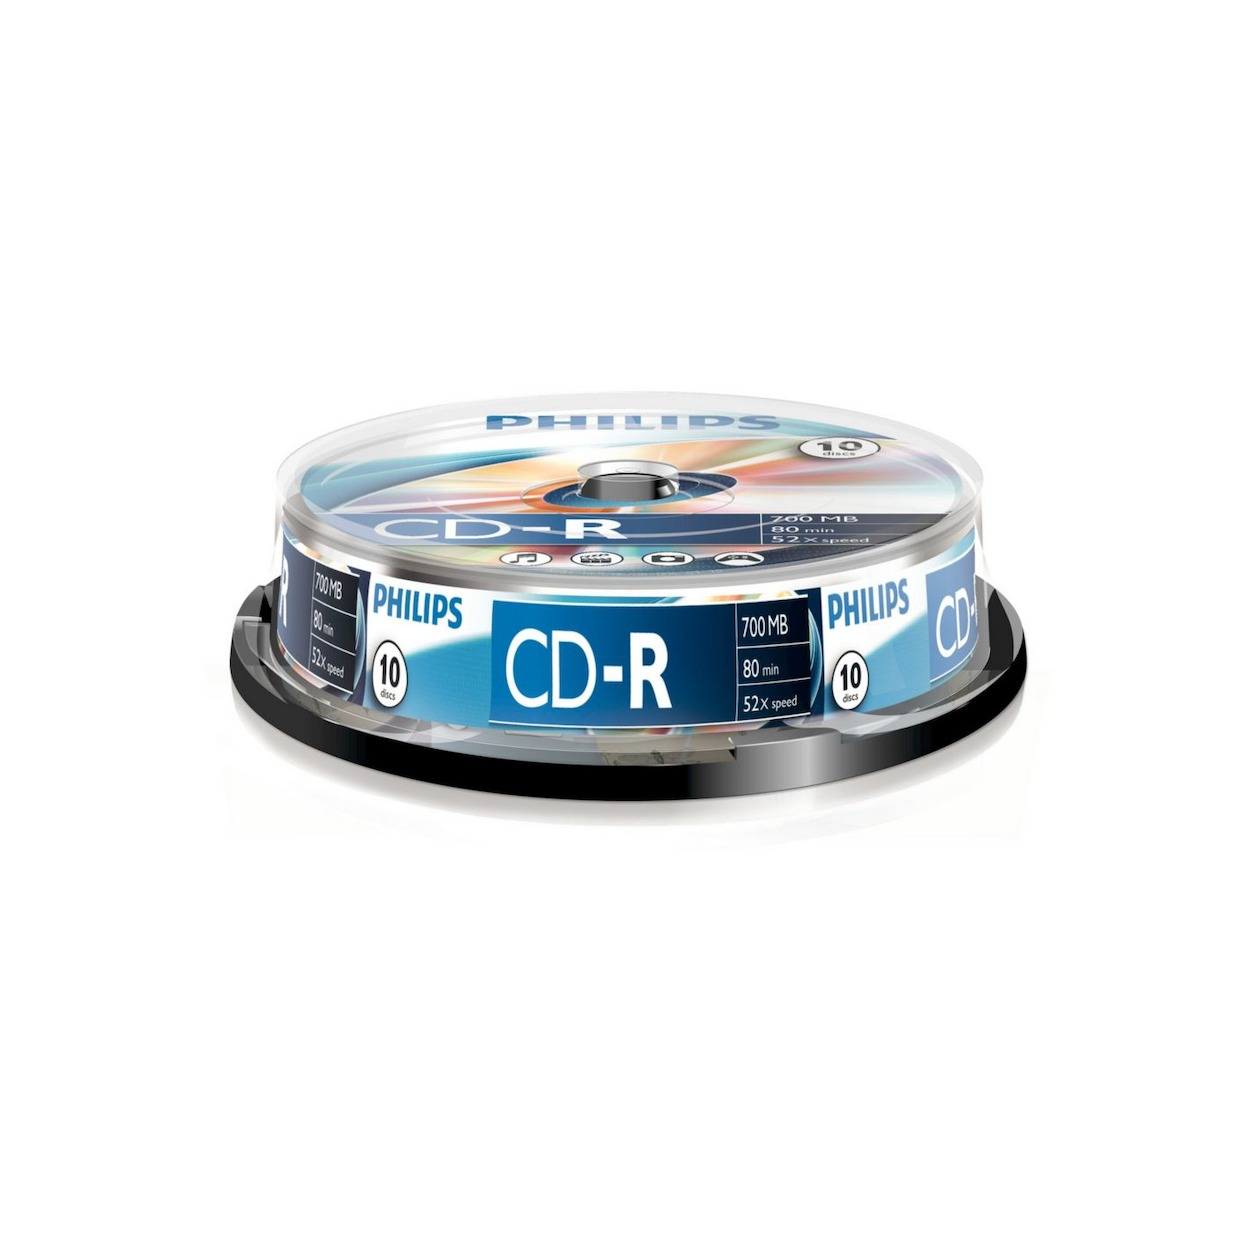 philips CD-R CR7D5NB10